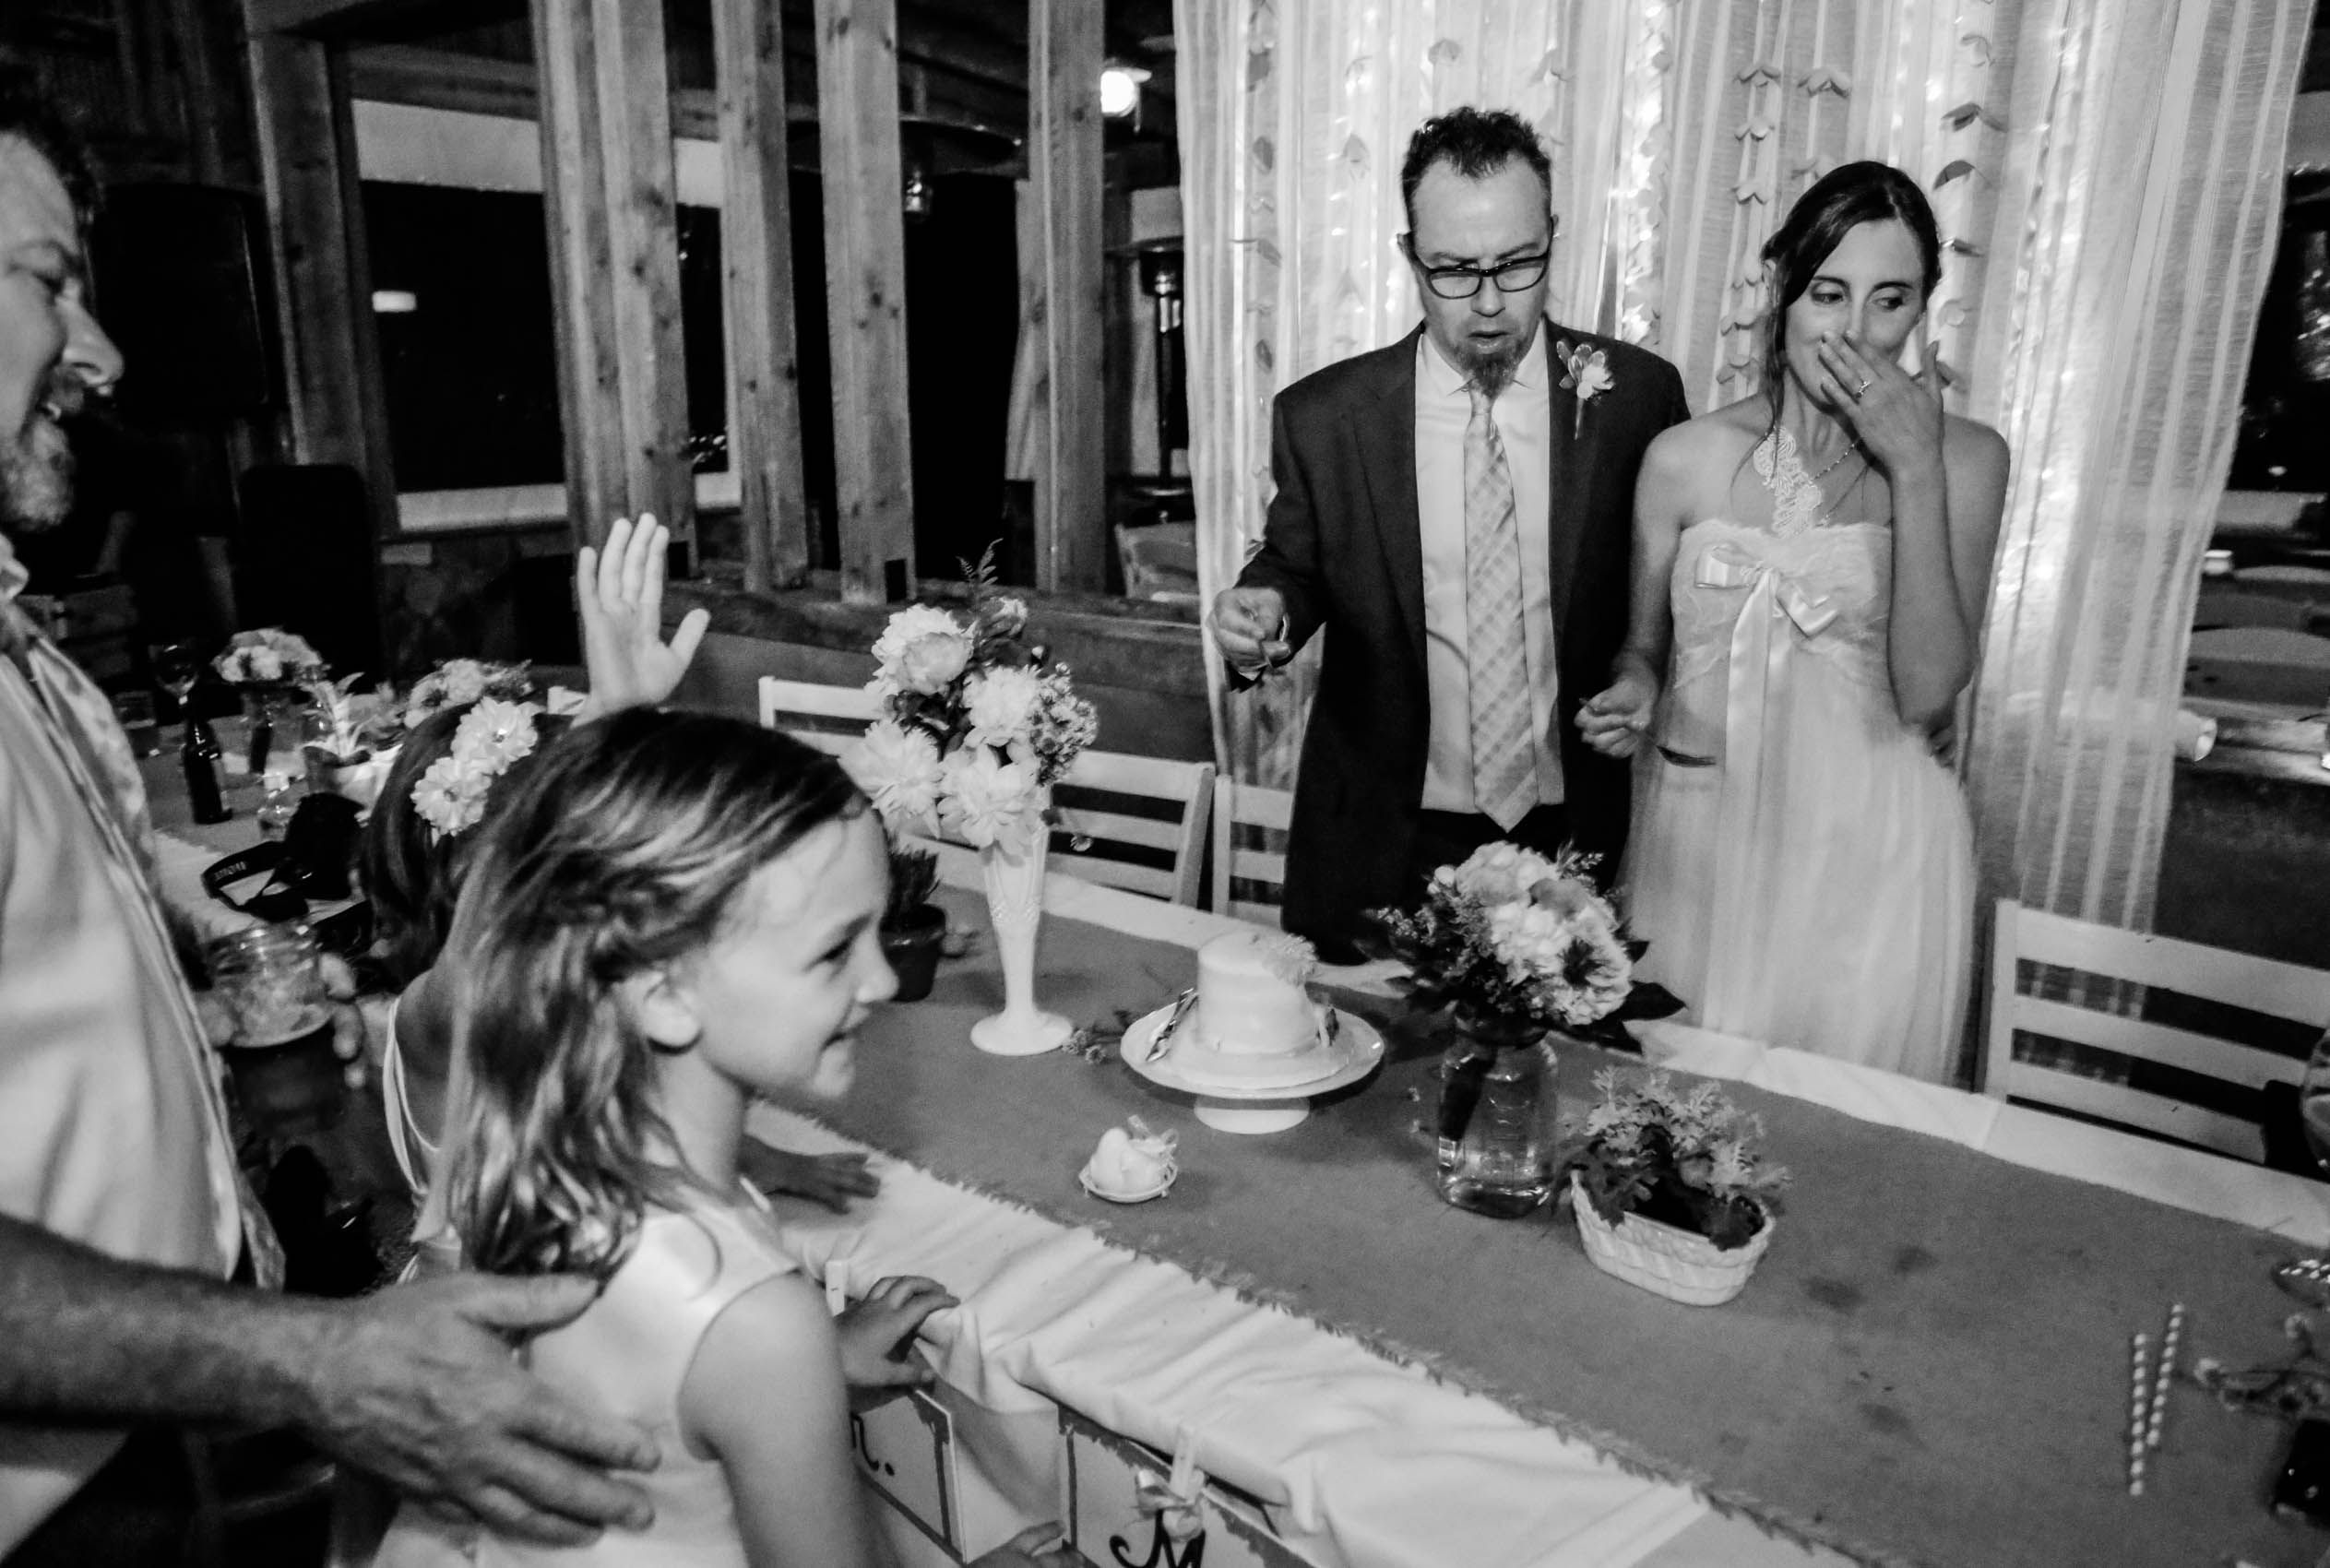 monroy_wedding_051813-645 (1).jpg